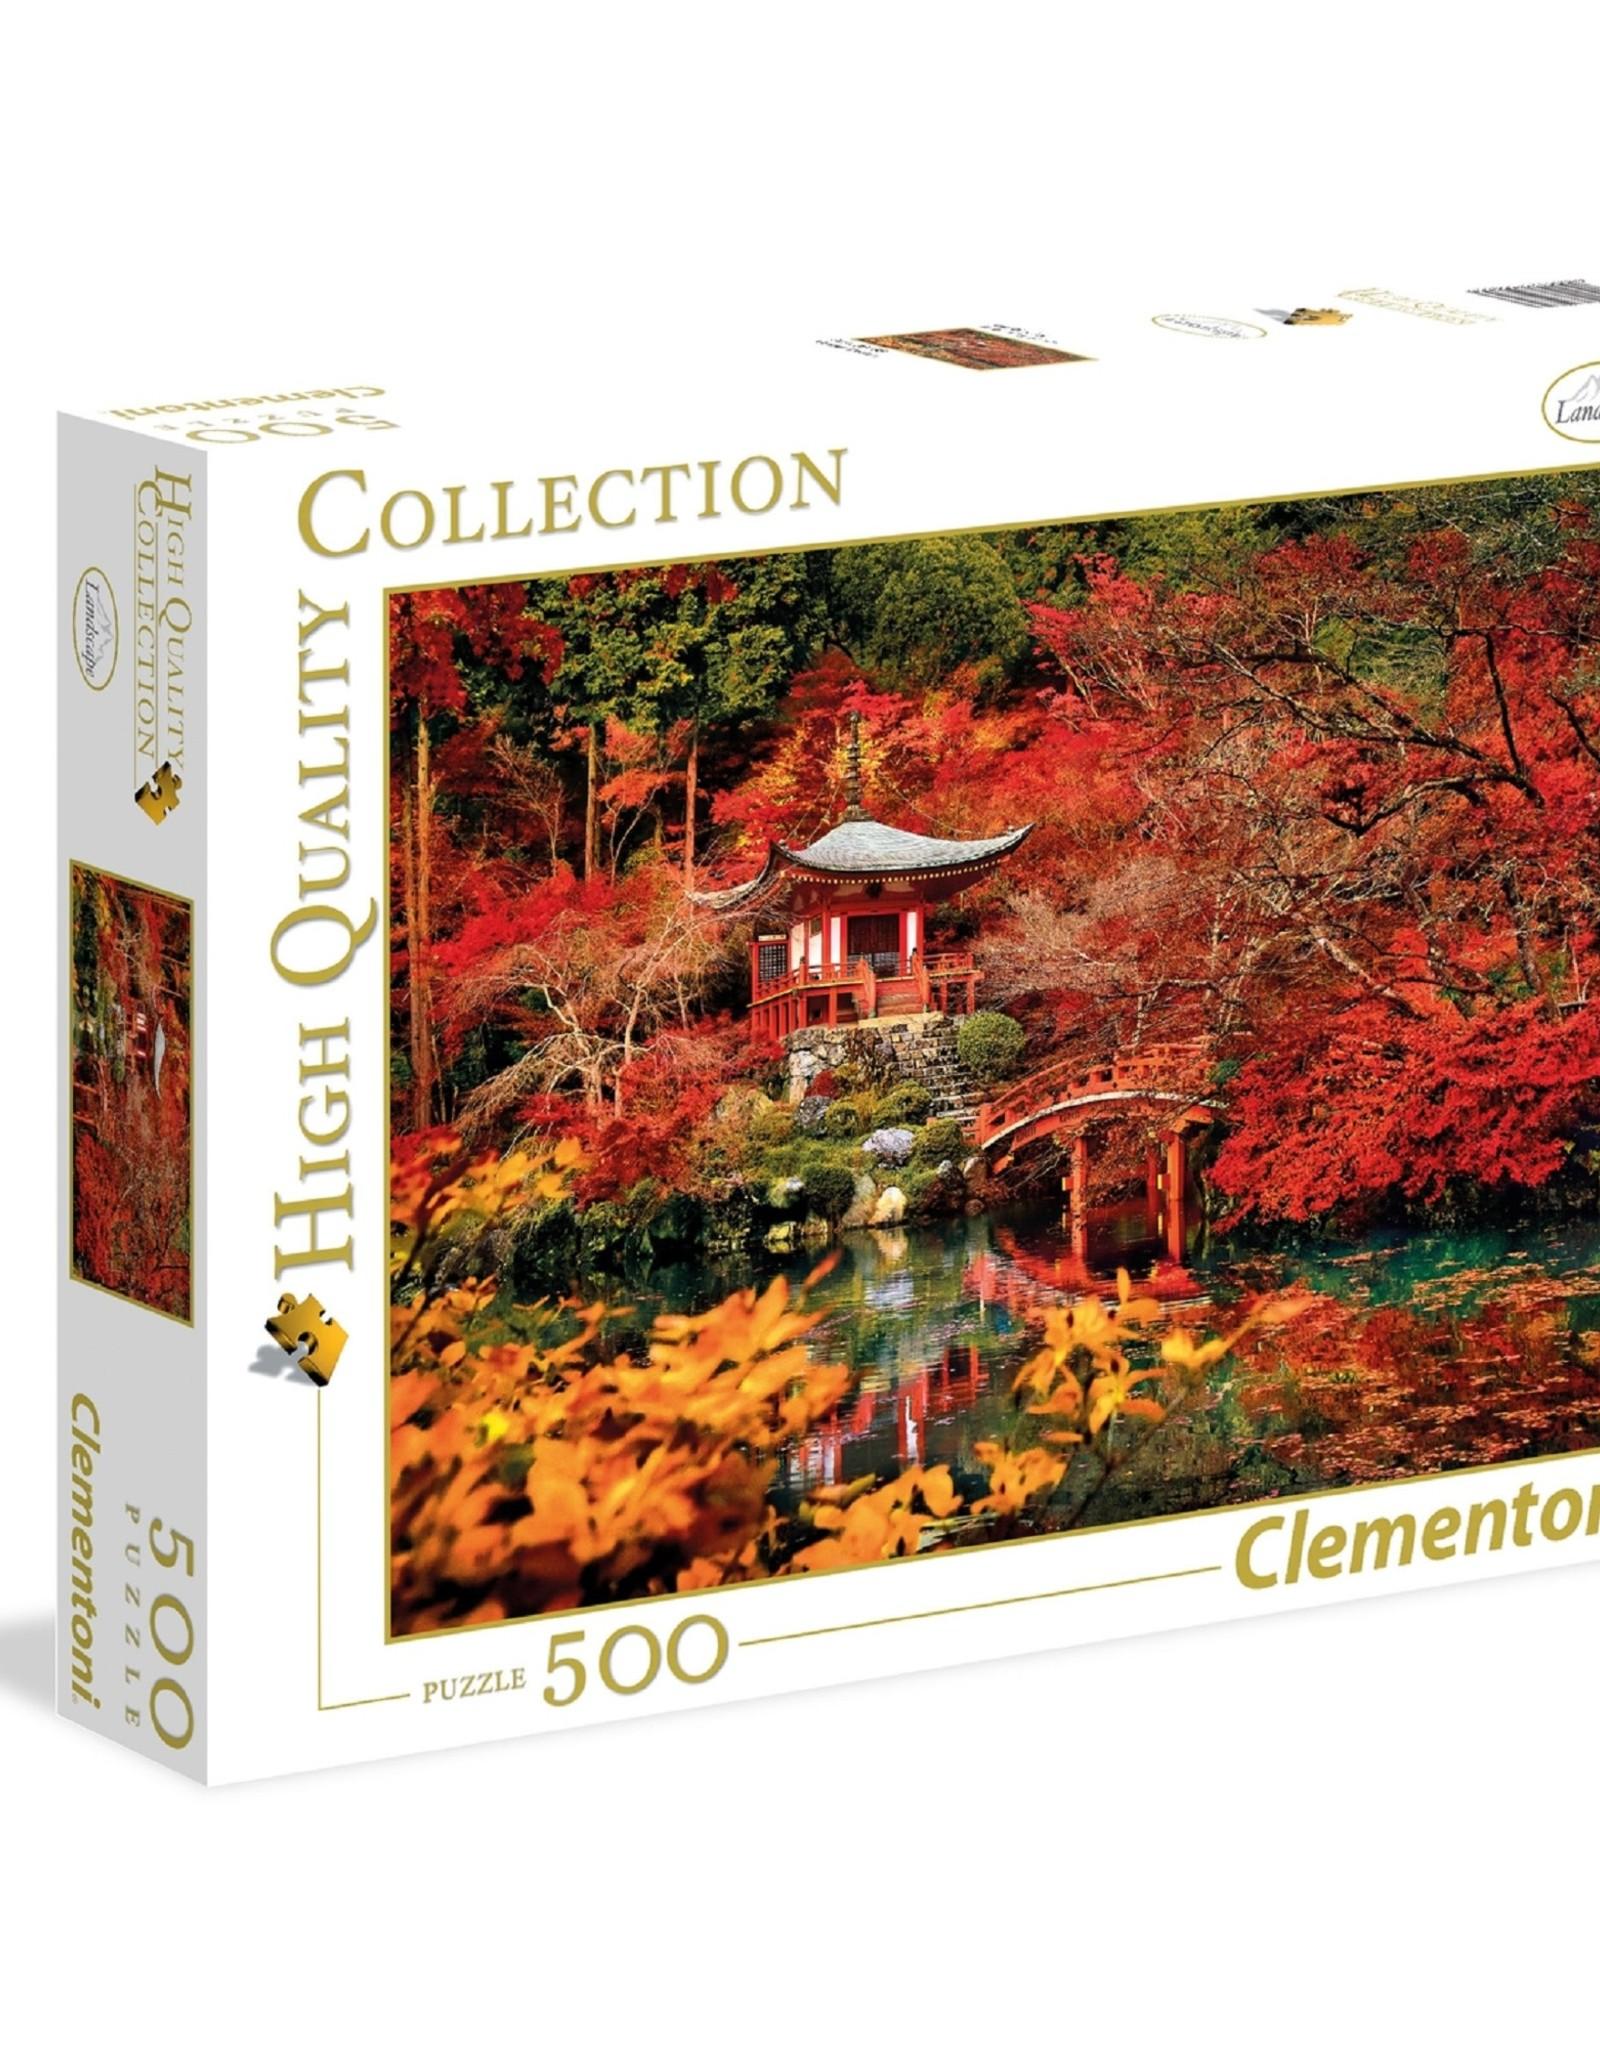 Clementoni 500PC HQC -ORIENT DREAM